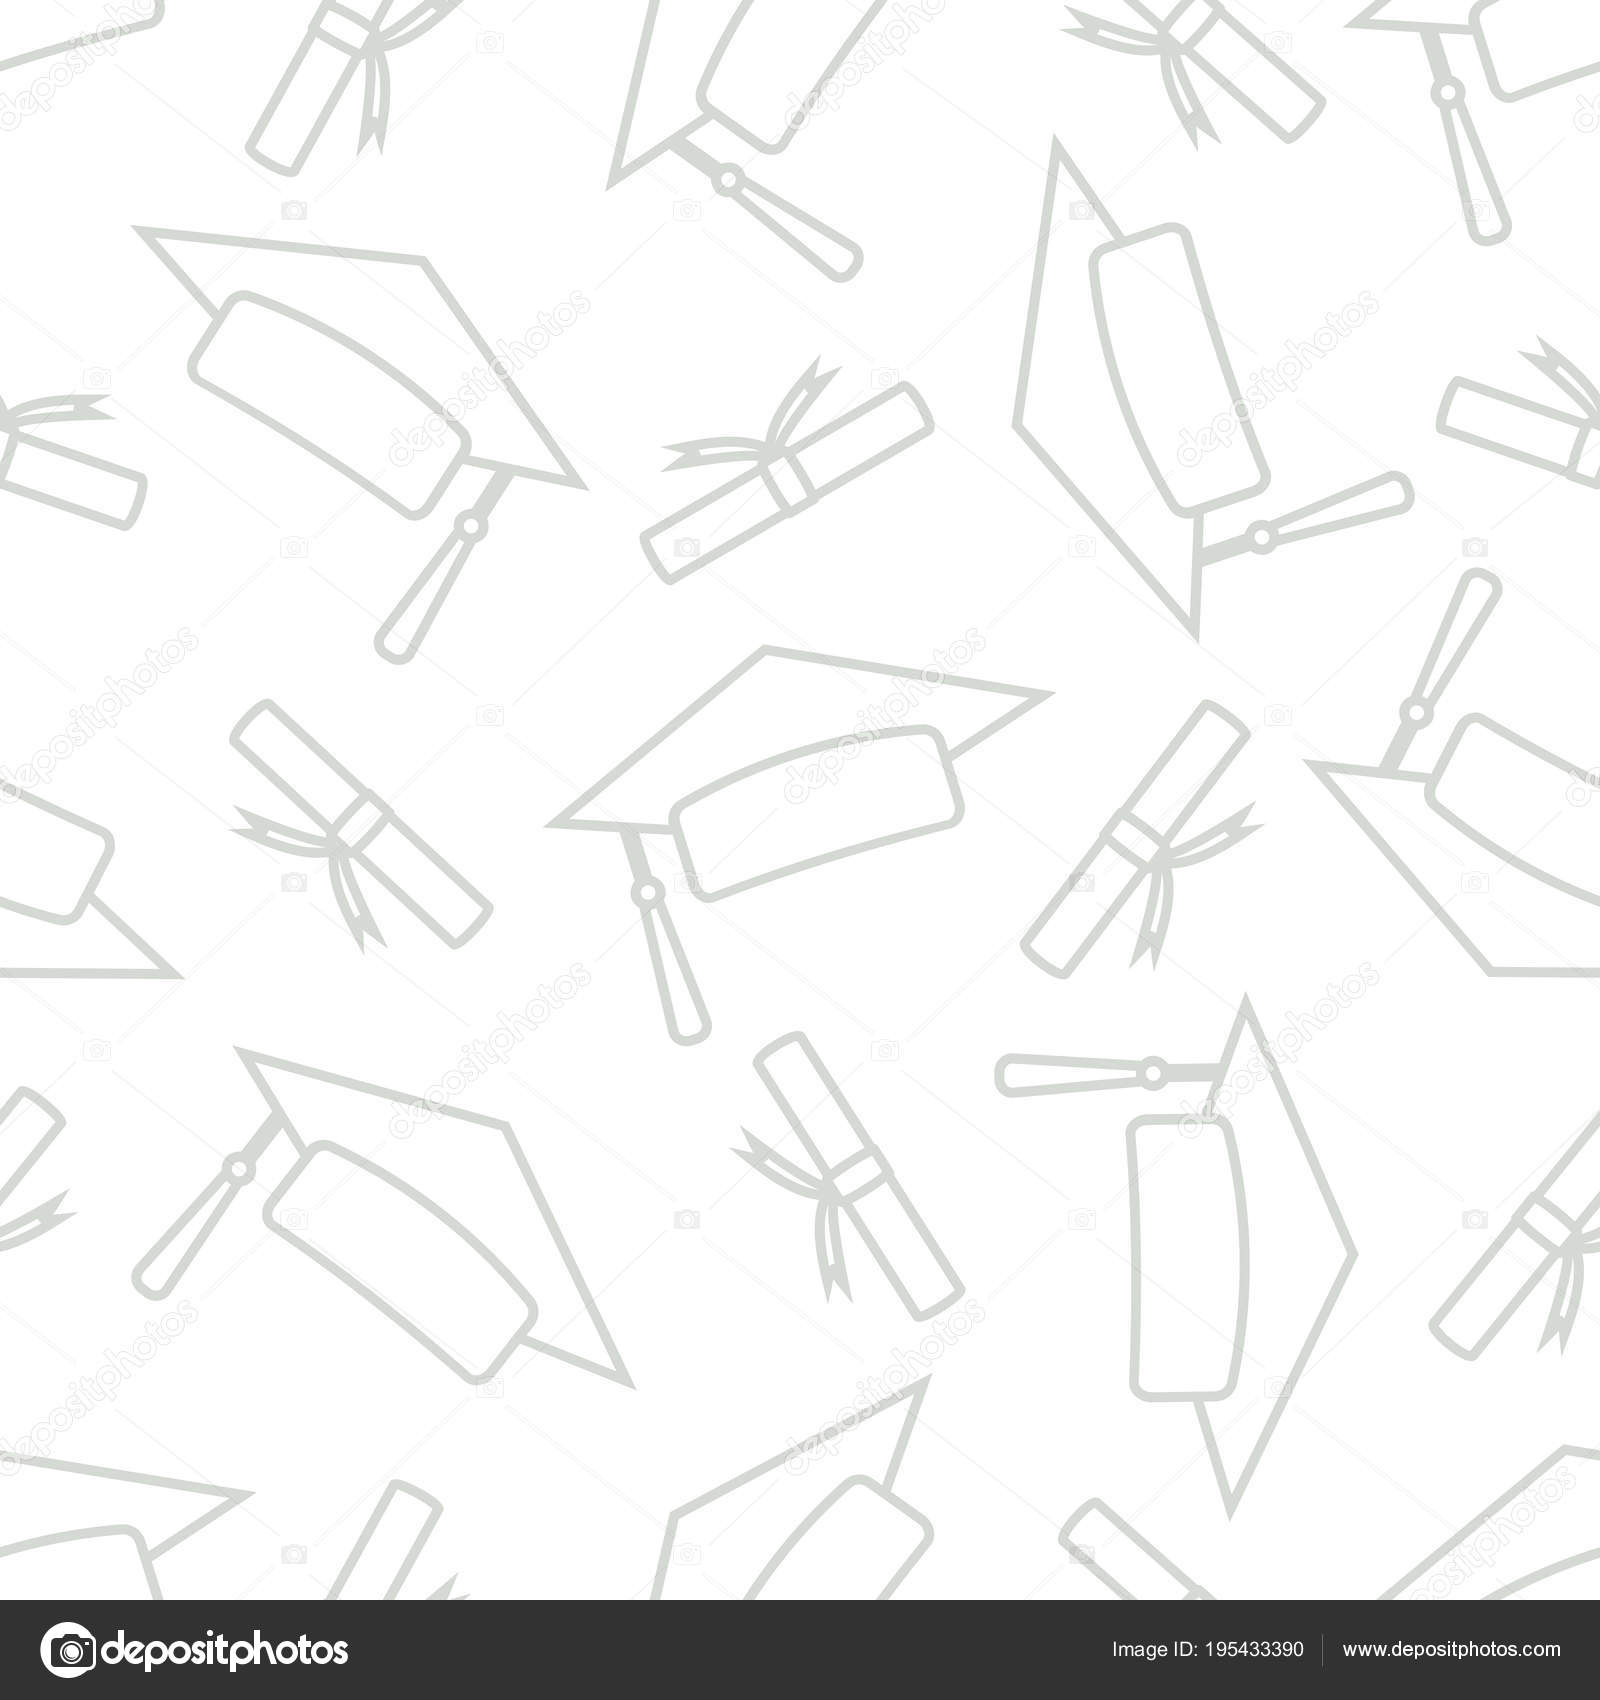 Postgrado tapas al azar sobre fondo blanco — Vector de stock ...